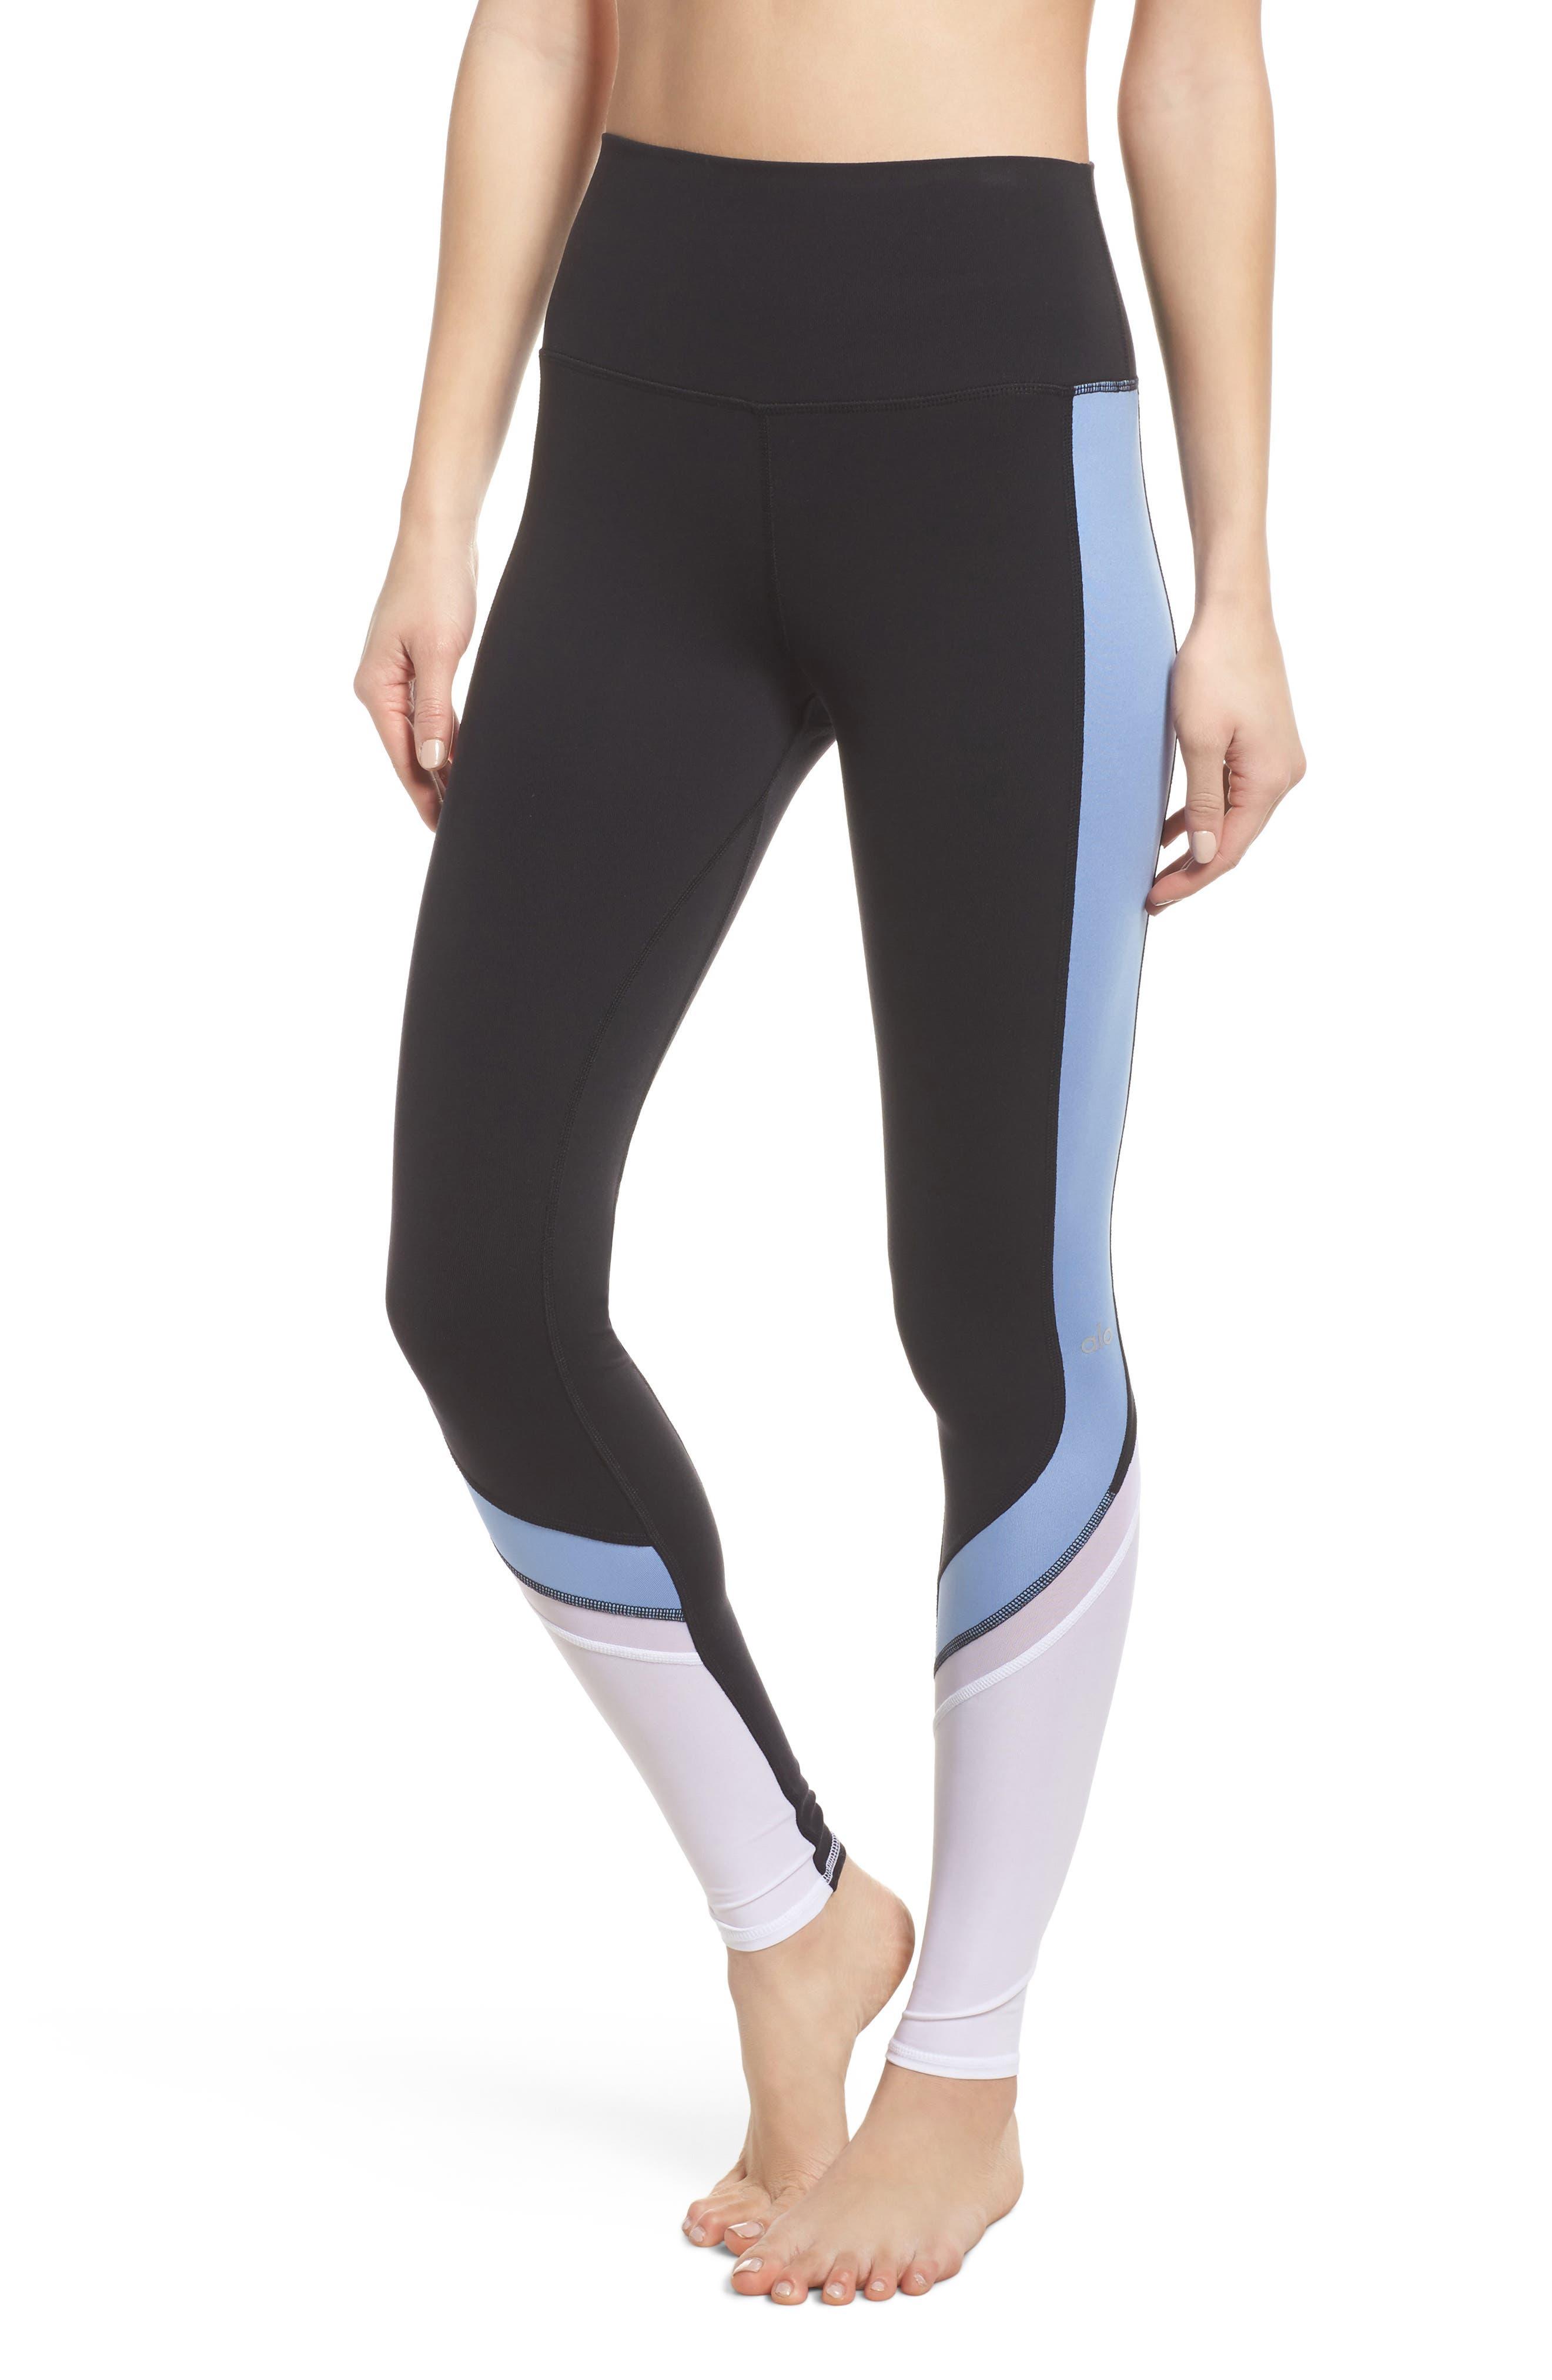 Elevate Leggings,                             Main thumbnail 1, color,                             Black/ Uv Blue Glossy/ White